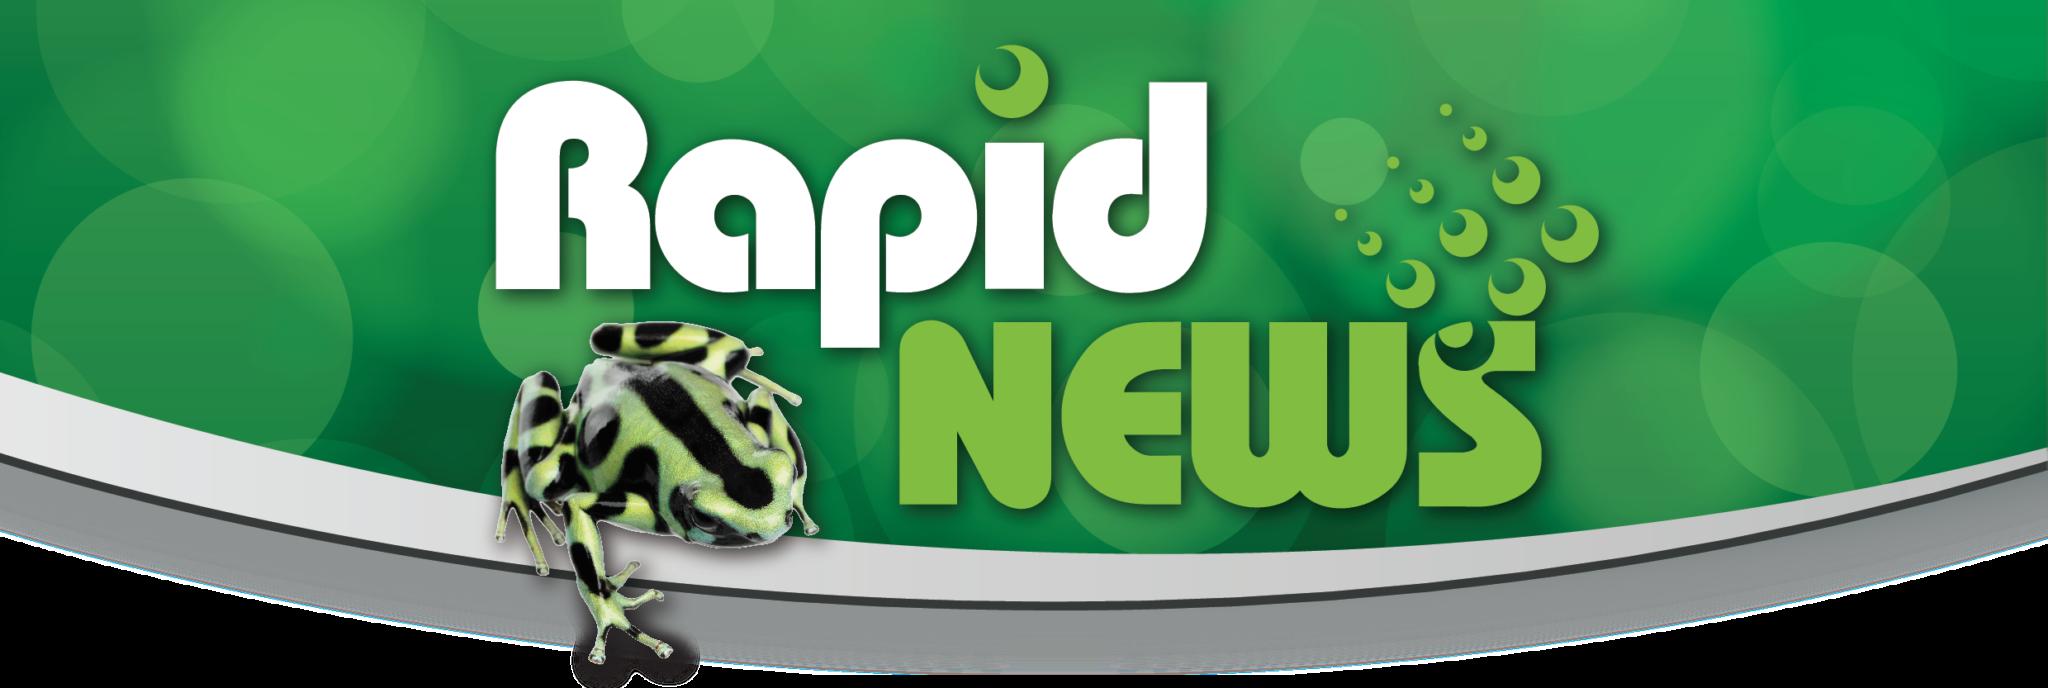 rapidnewsbanner_cmyk_small-01-01